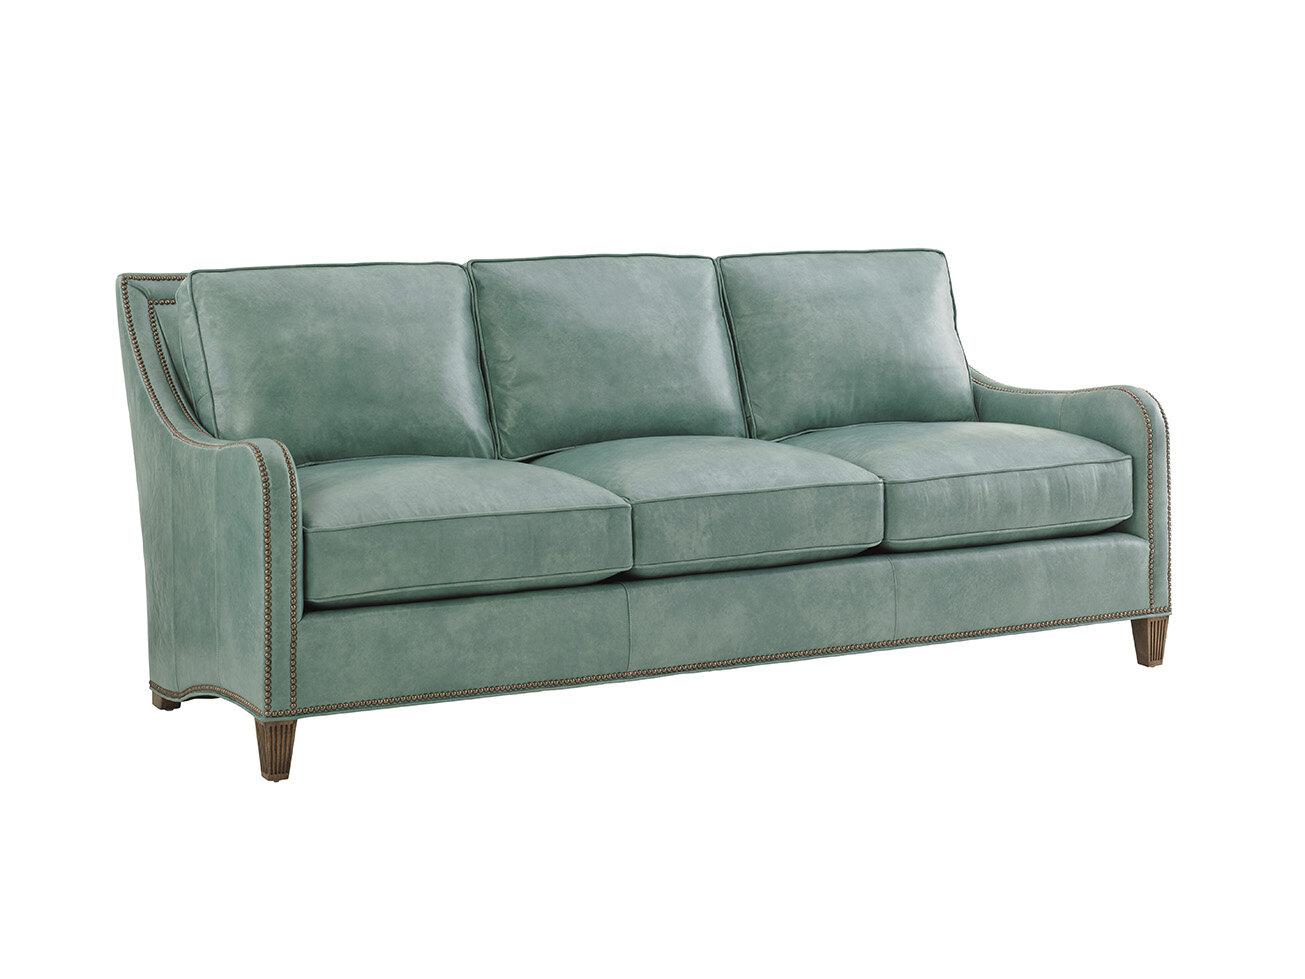 Twin Palms Leather Sofa | Joss & Main